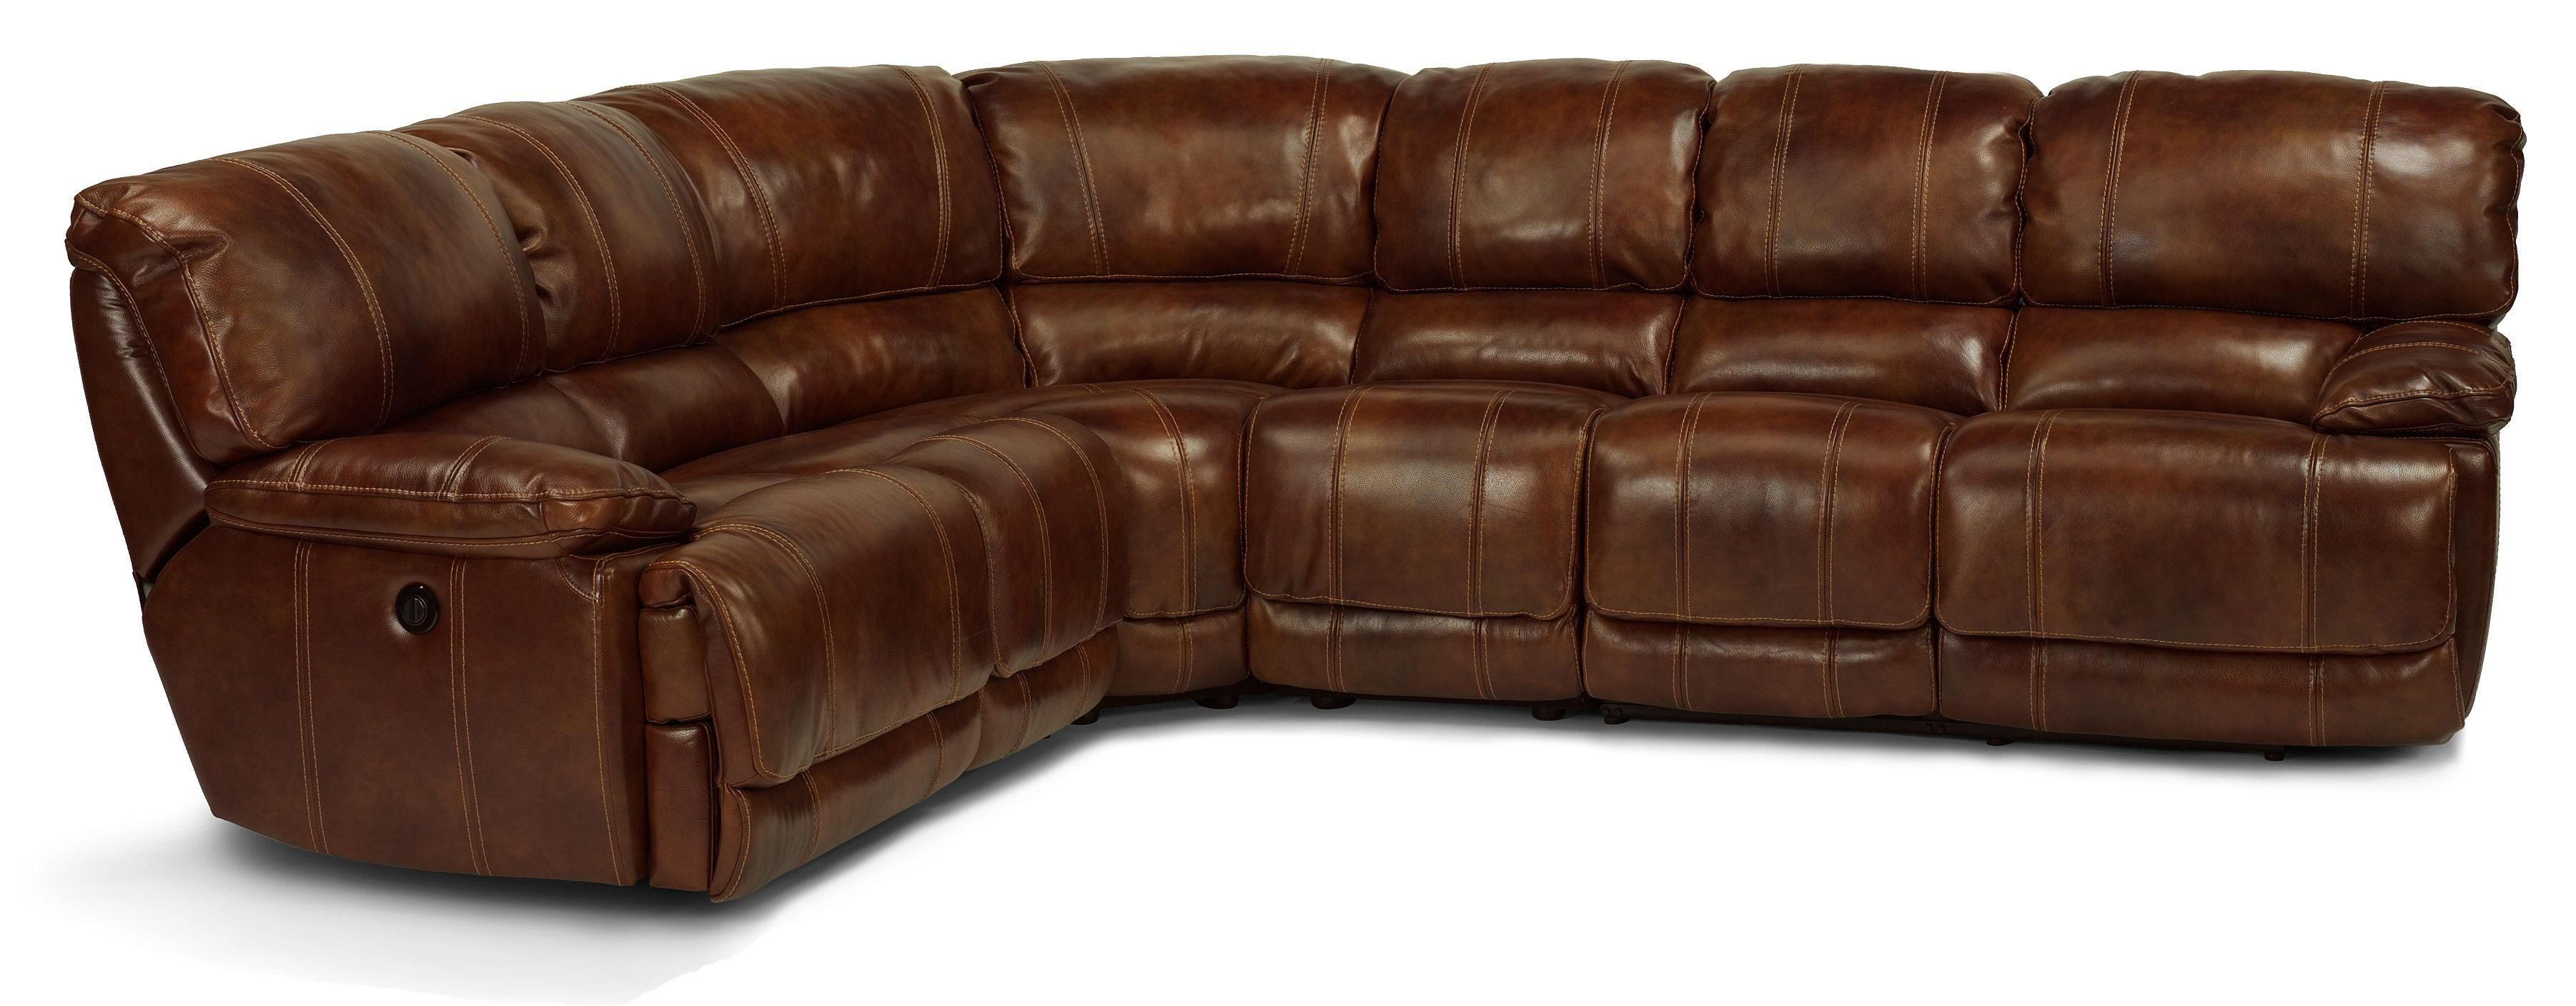 Belmont 4 Pc Power Reclining Sectional Sofa by Flexsteel